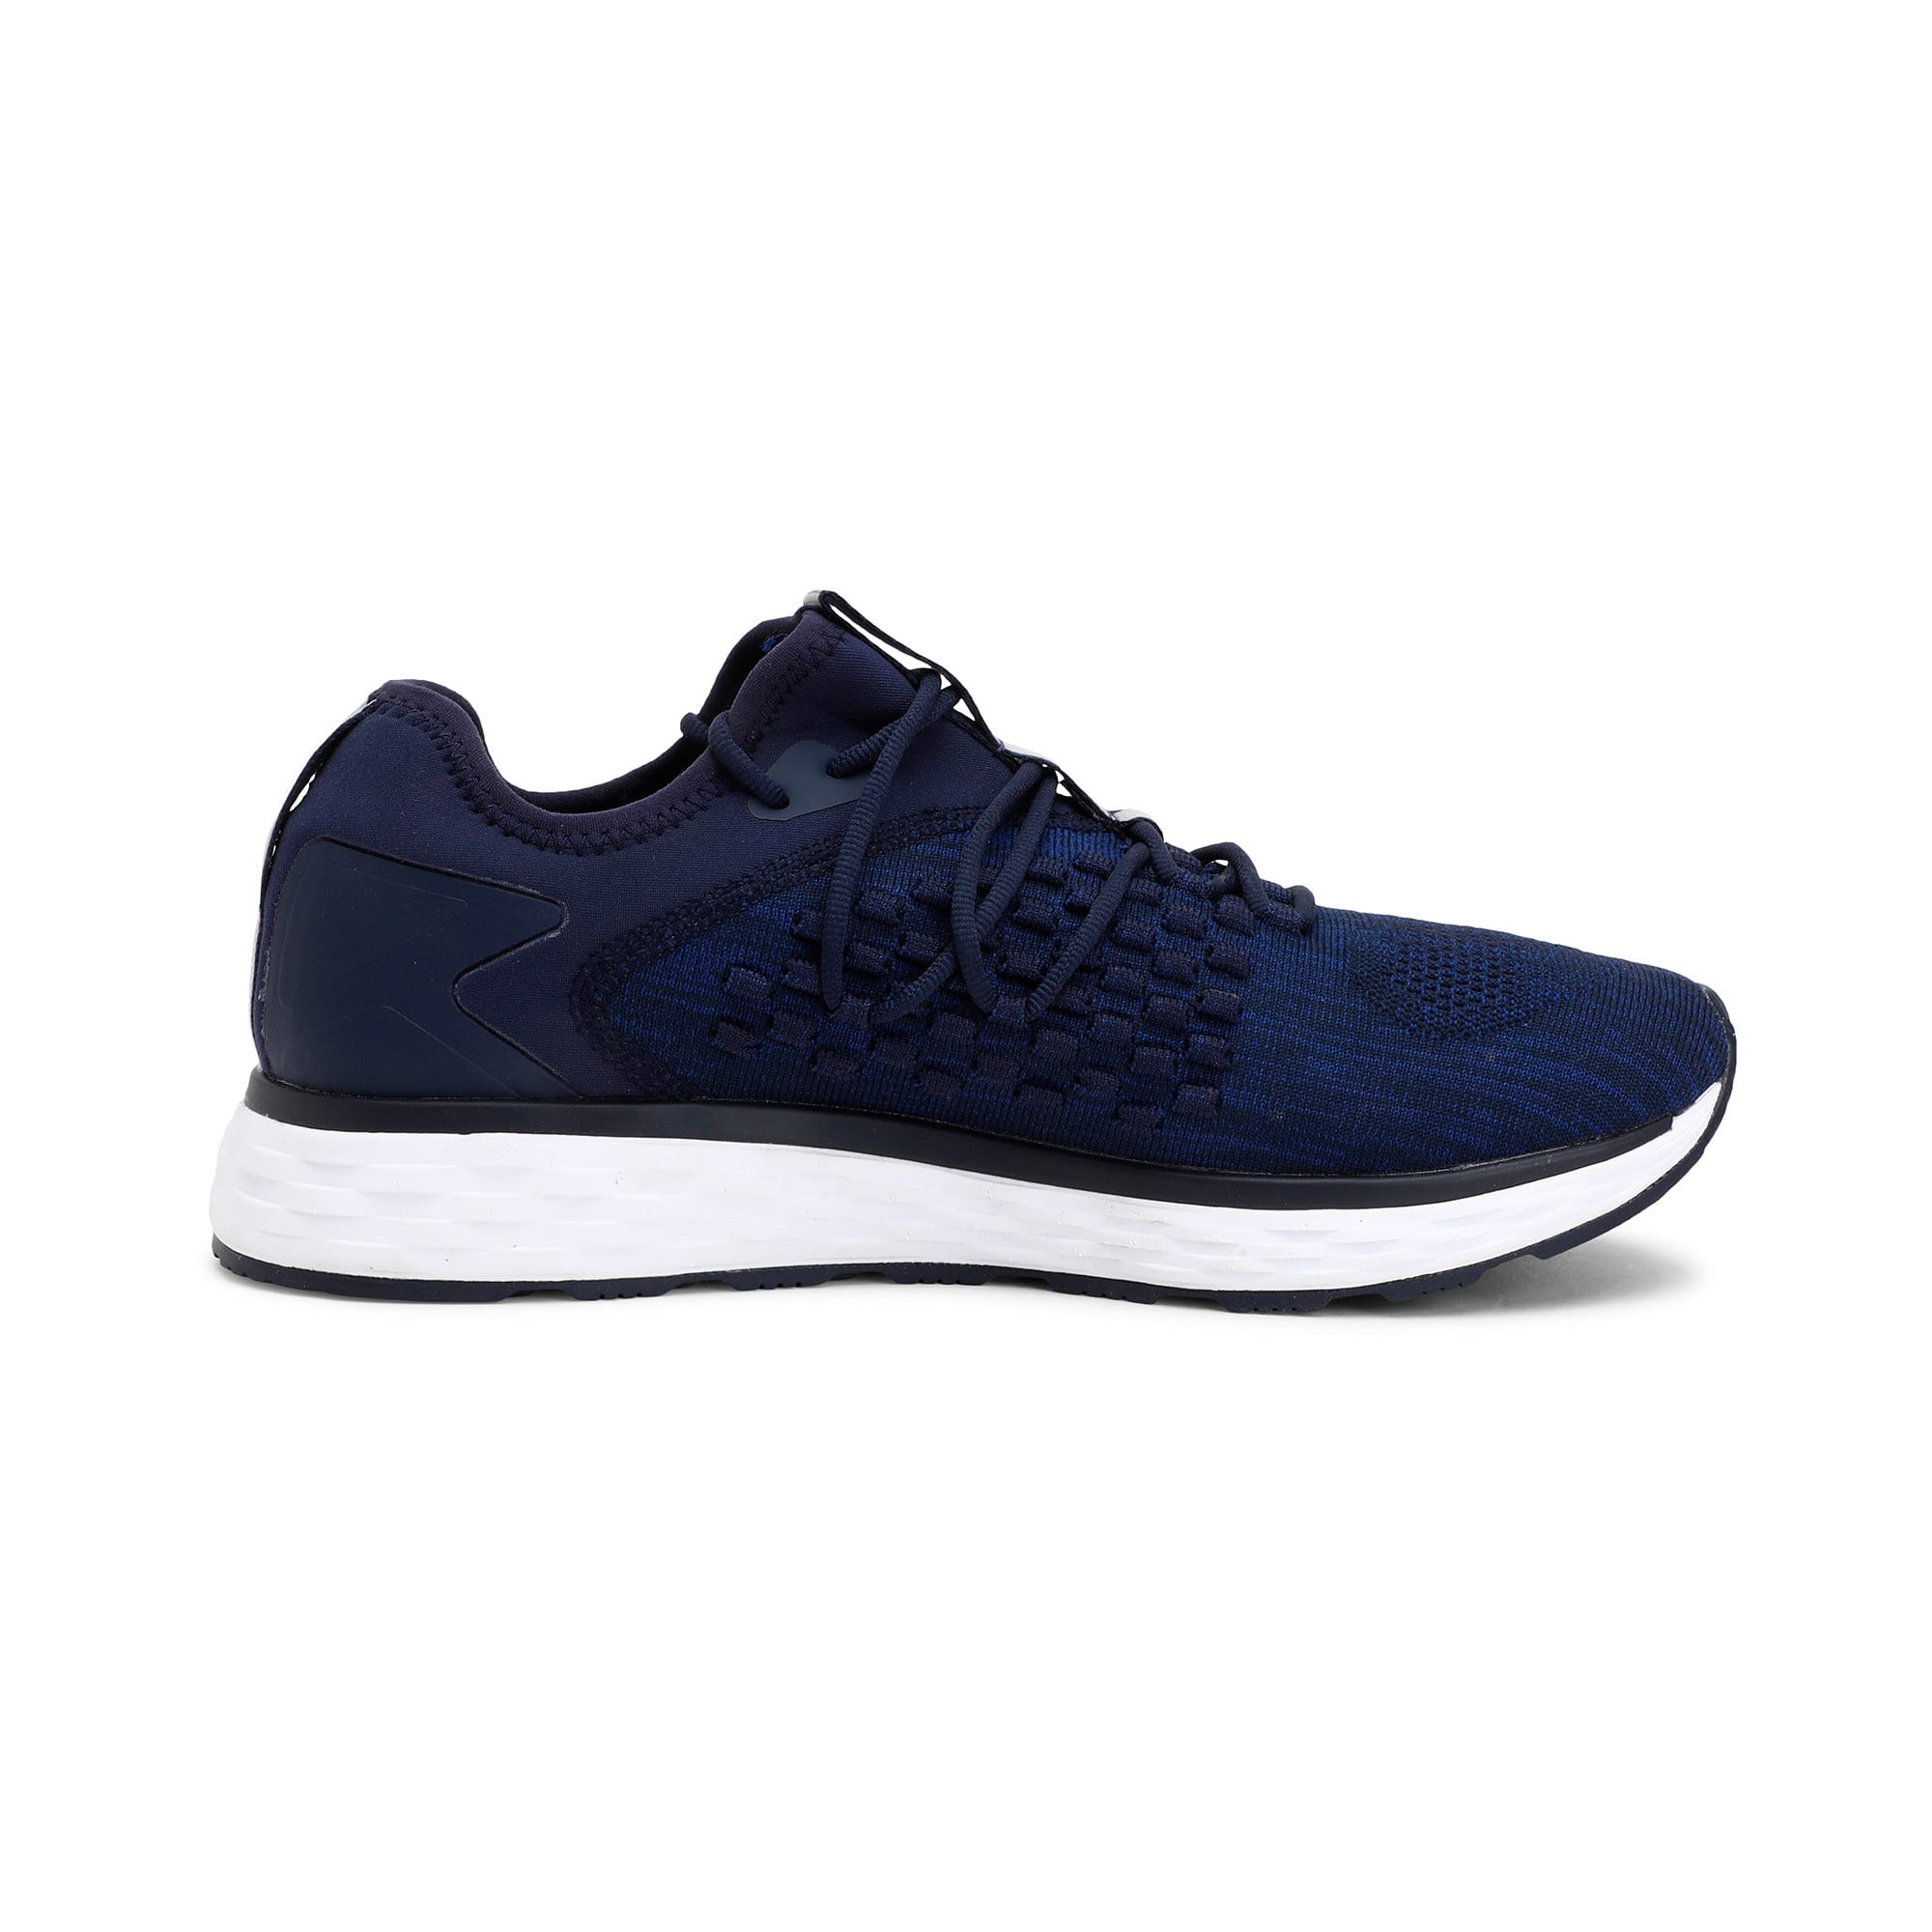 Thumbnail 5 of SPEED FUSEFIT Men's Running Shoes, Peacoat-Sodalite Blue, medium-IND